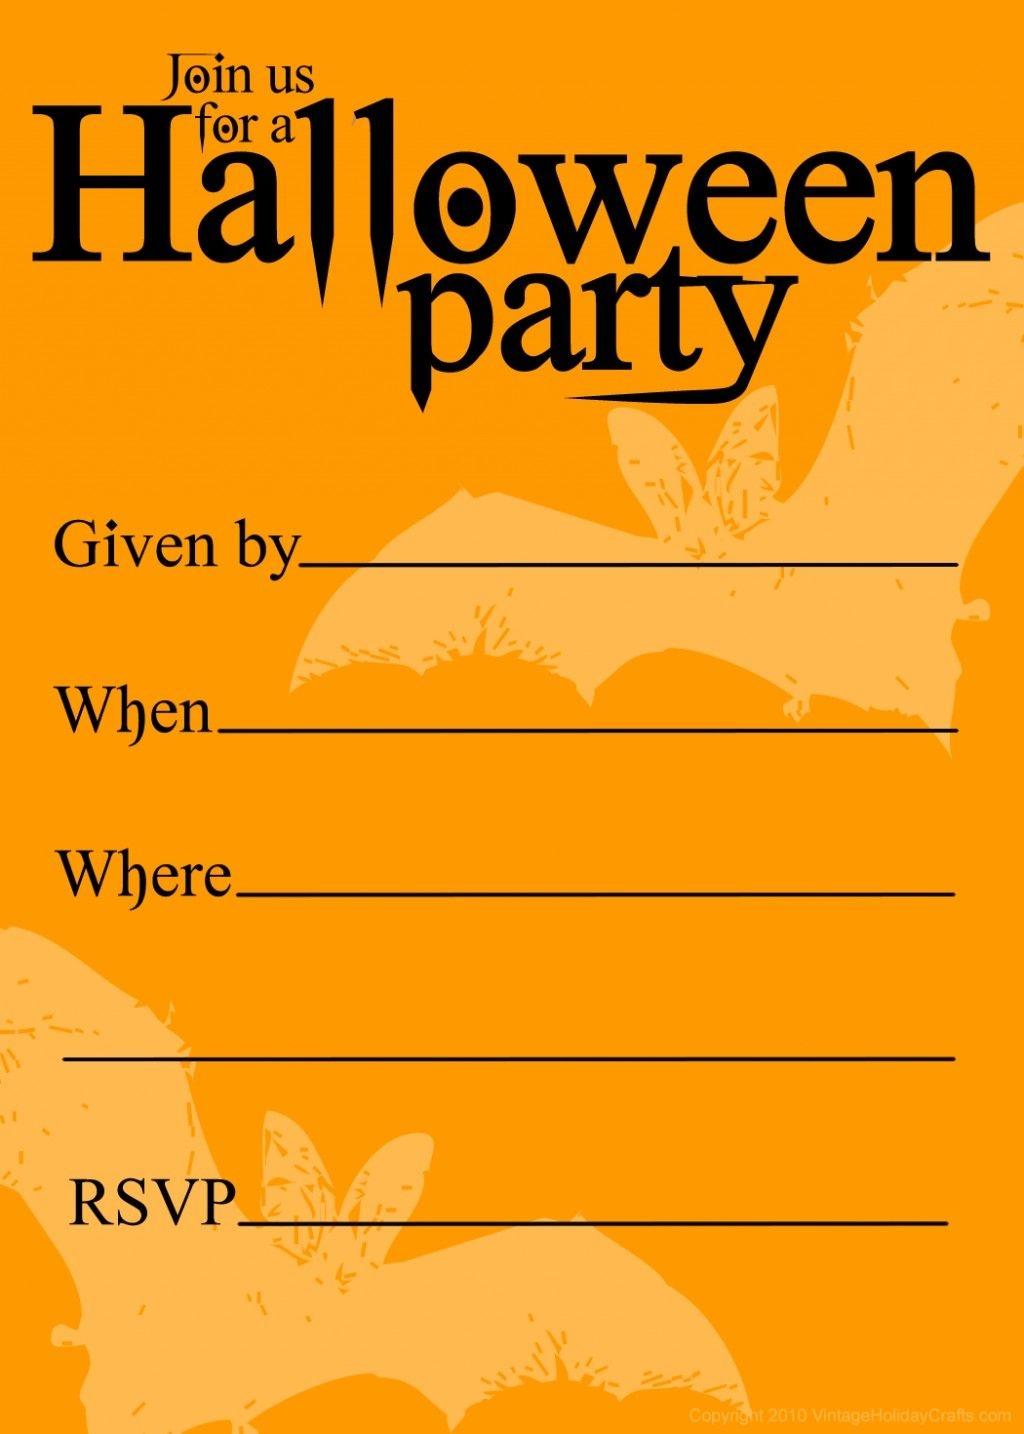 Free Printable Halloween Birthday Invitations Templates | Halloween - Halloween Party Invitation Templates Free Printable